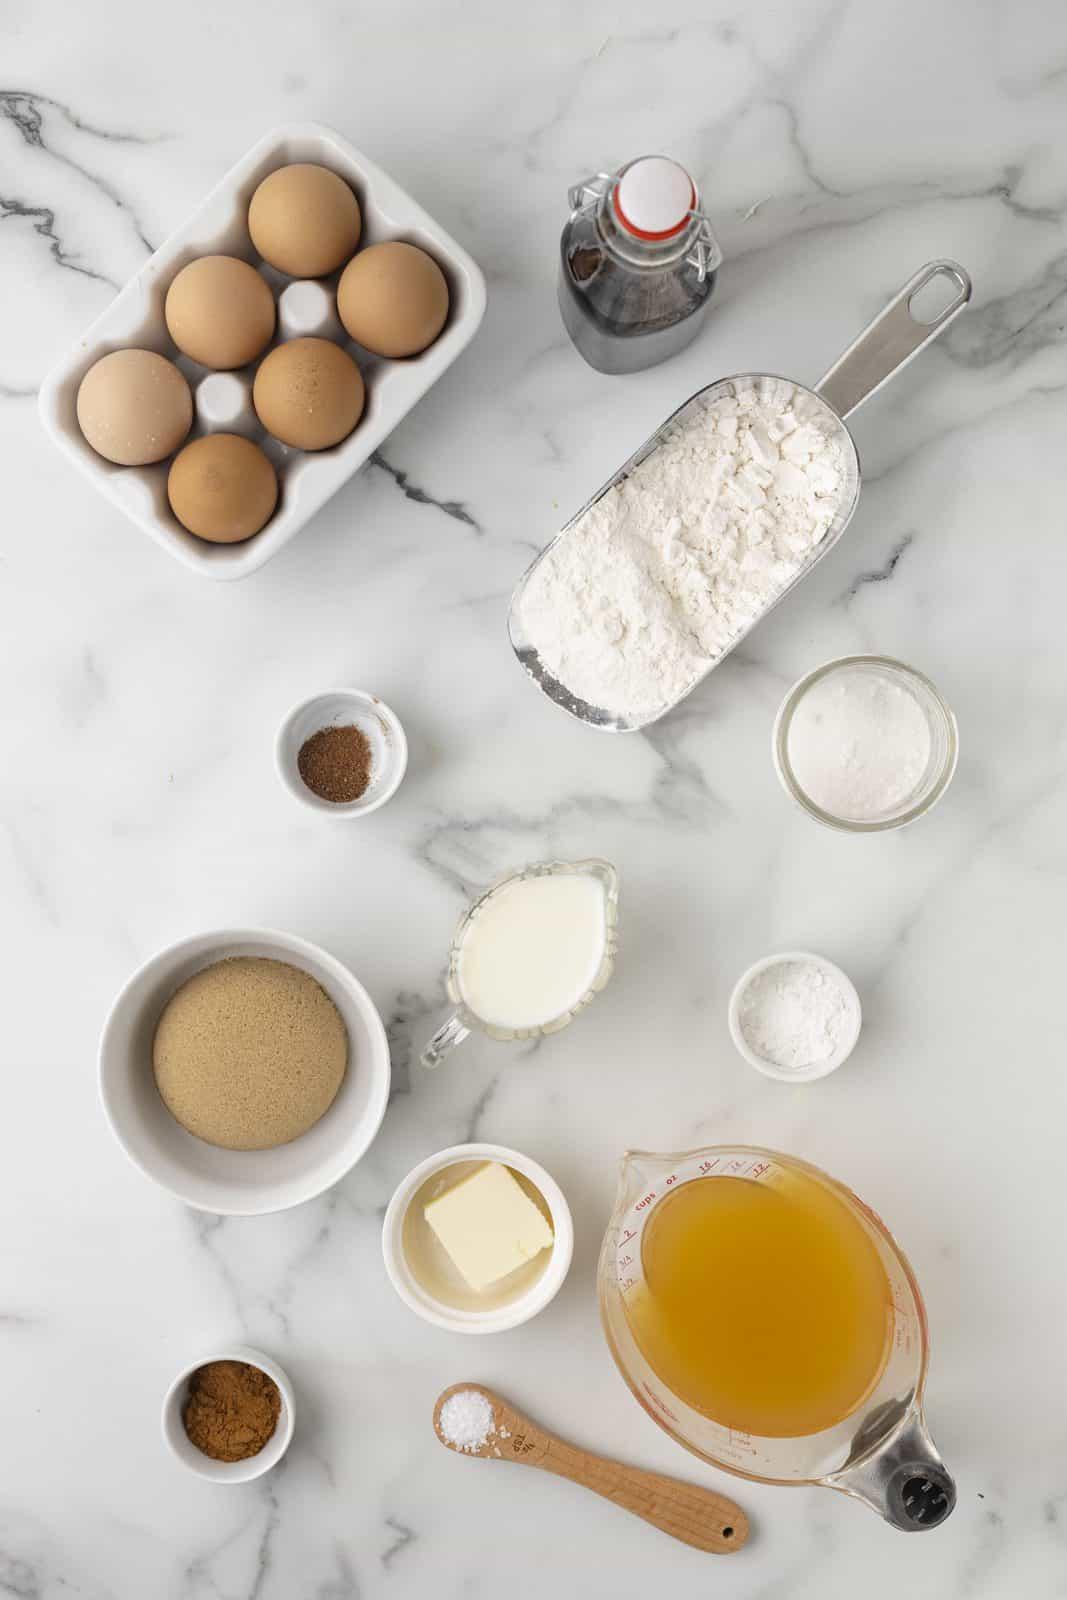 Ingredients needed: apple cider, cake flour, baking powder, cinnamon, salt, nutmeg, milk, brown sugar, granulated sugar, egg, unsalted butter and vanilla extract.